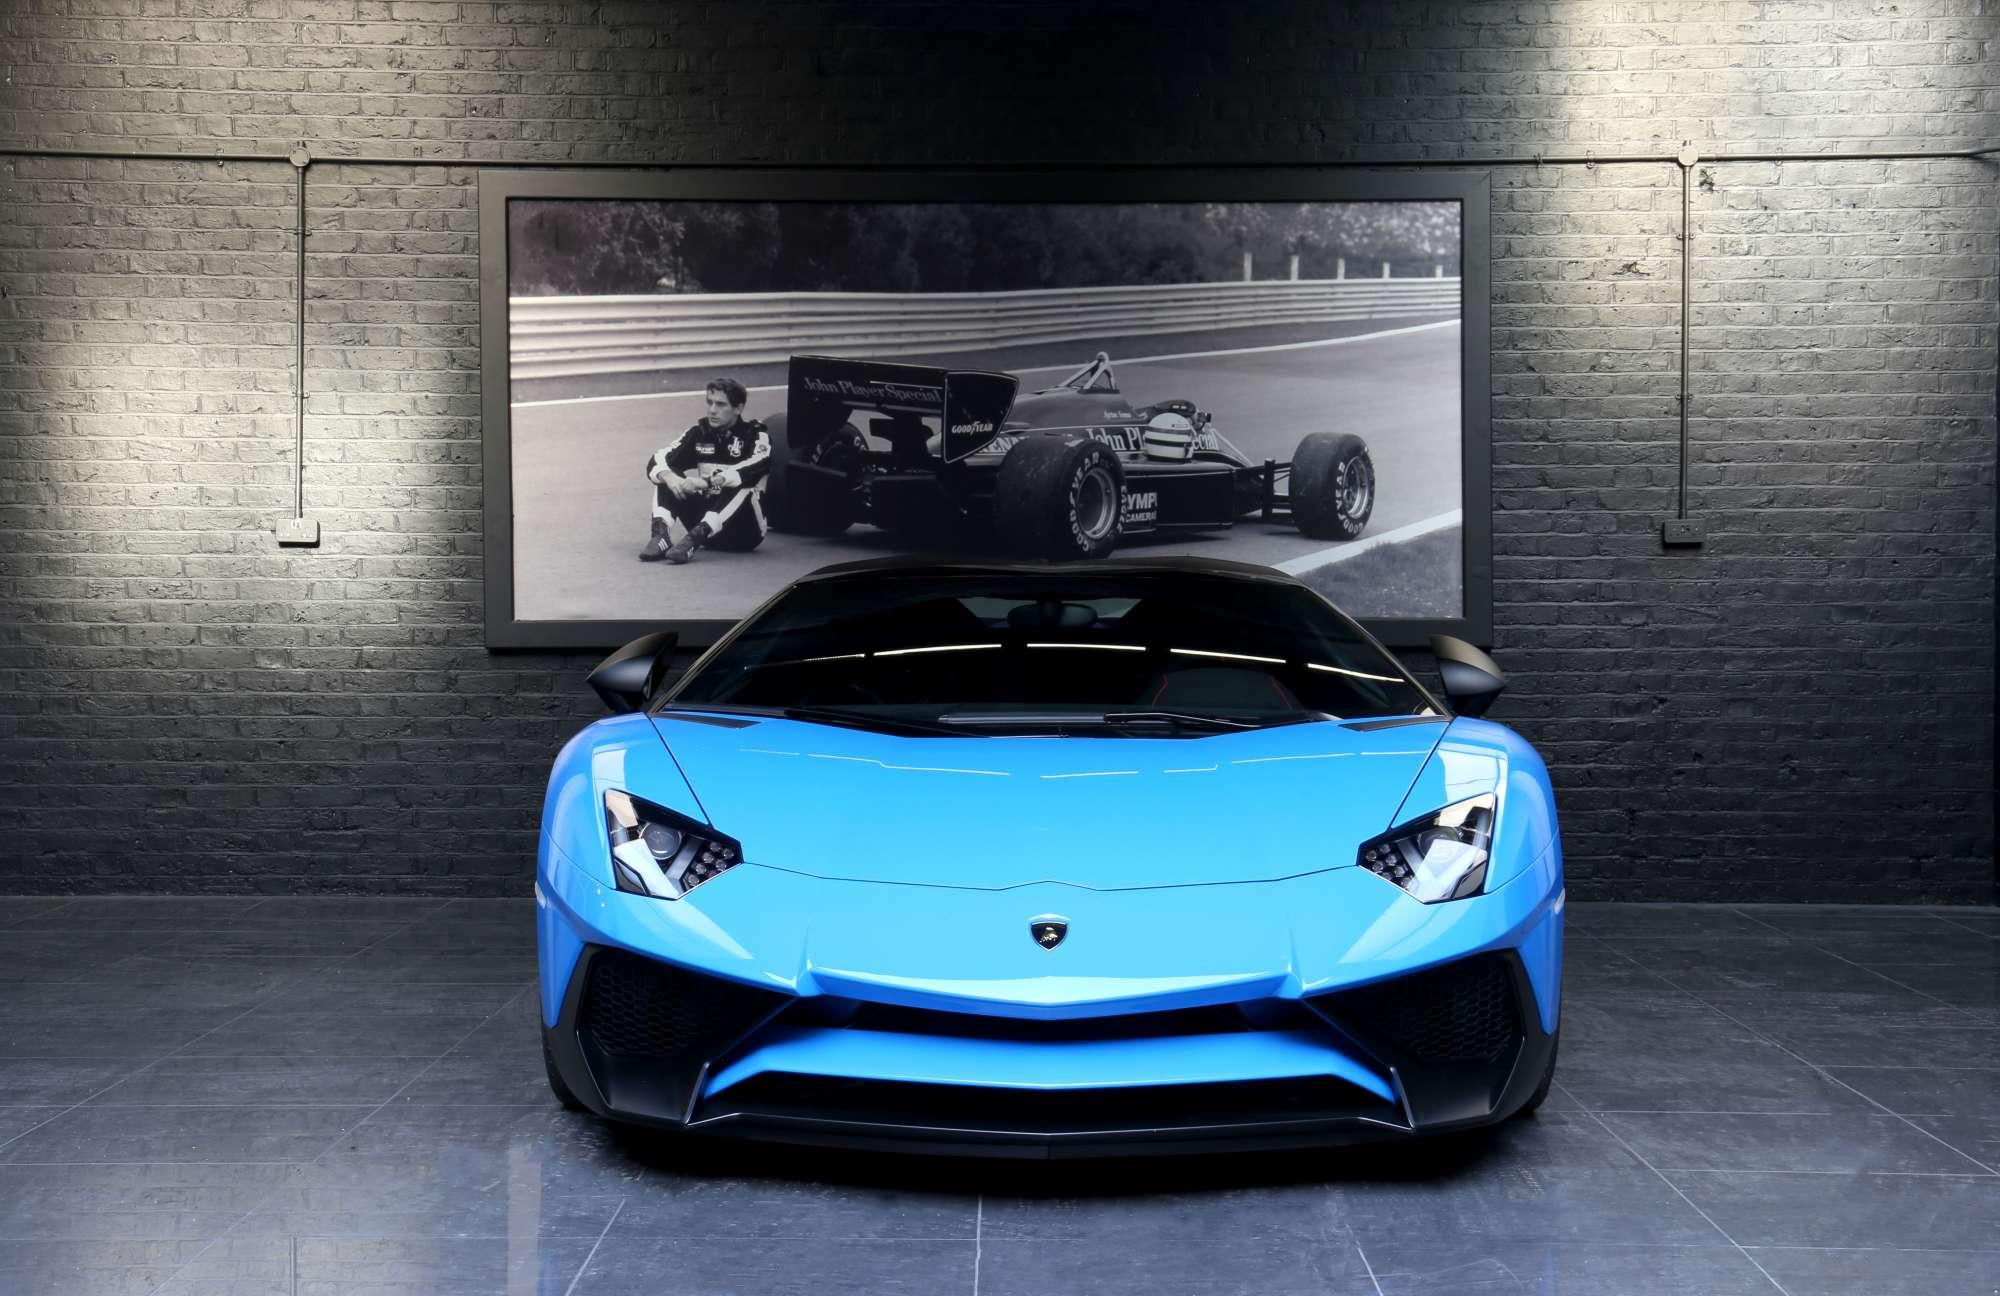 High Mileage Cars >> LAMBORGHINI AVENTADOR LP750-4 SV ROADSTER - Pegasus Auto House